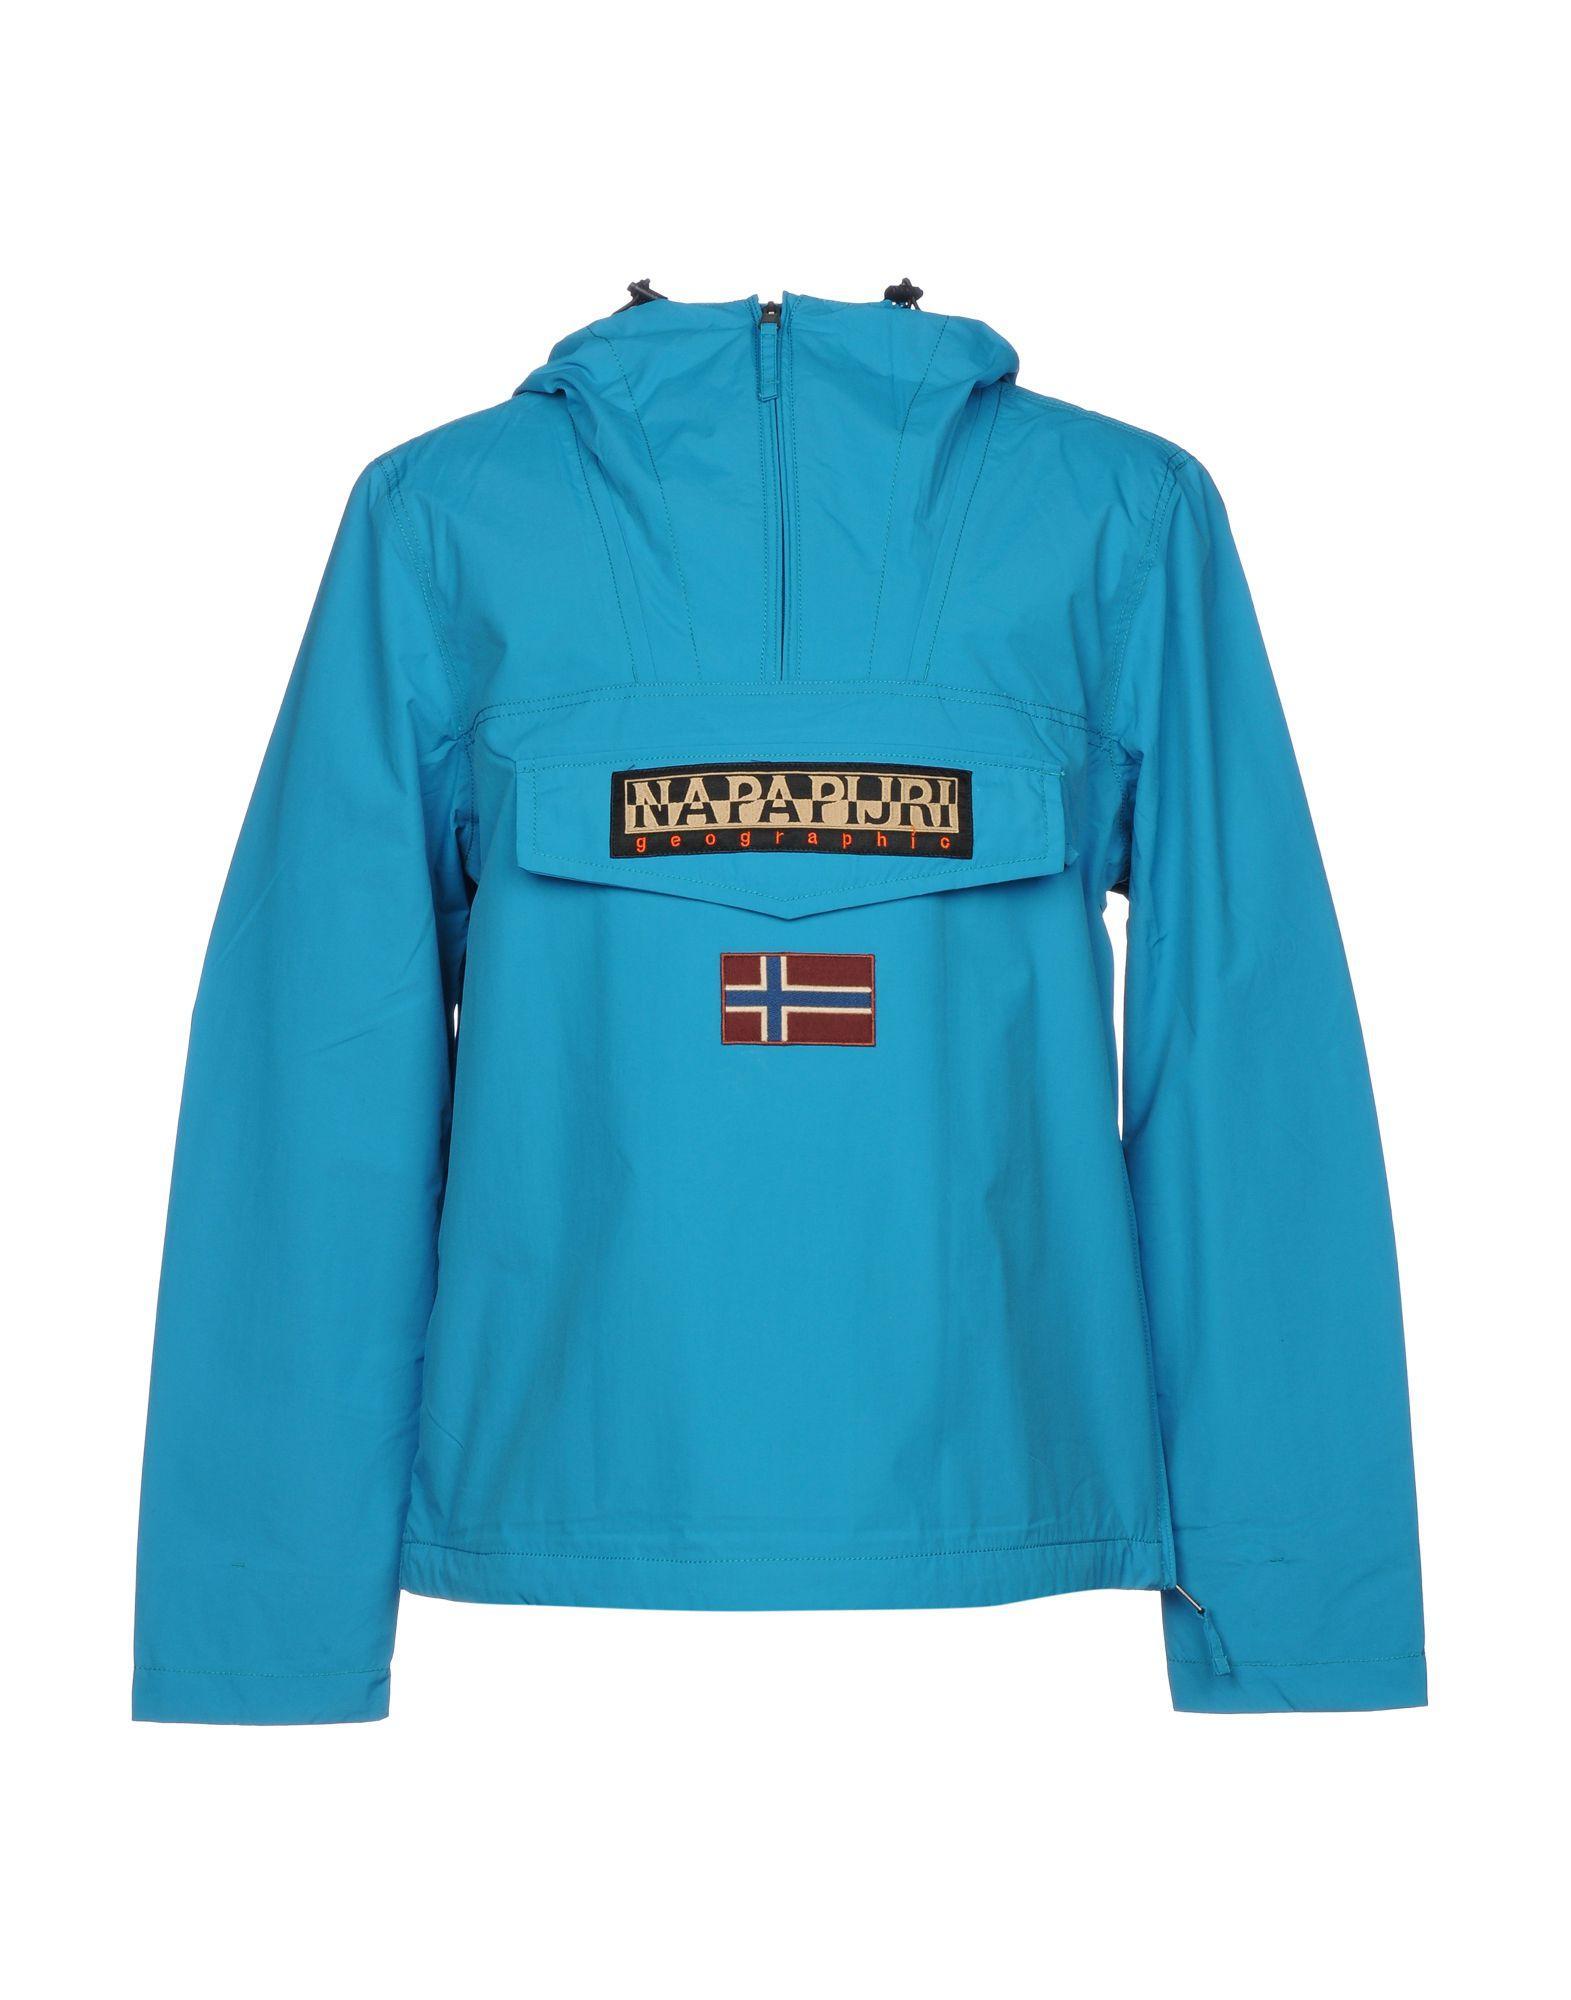 Napapijri Jackets In Turquoise